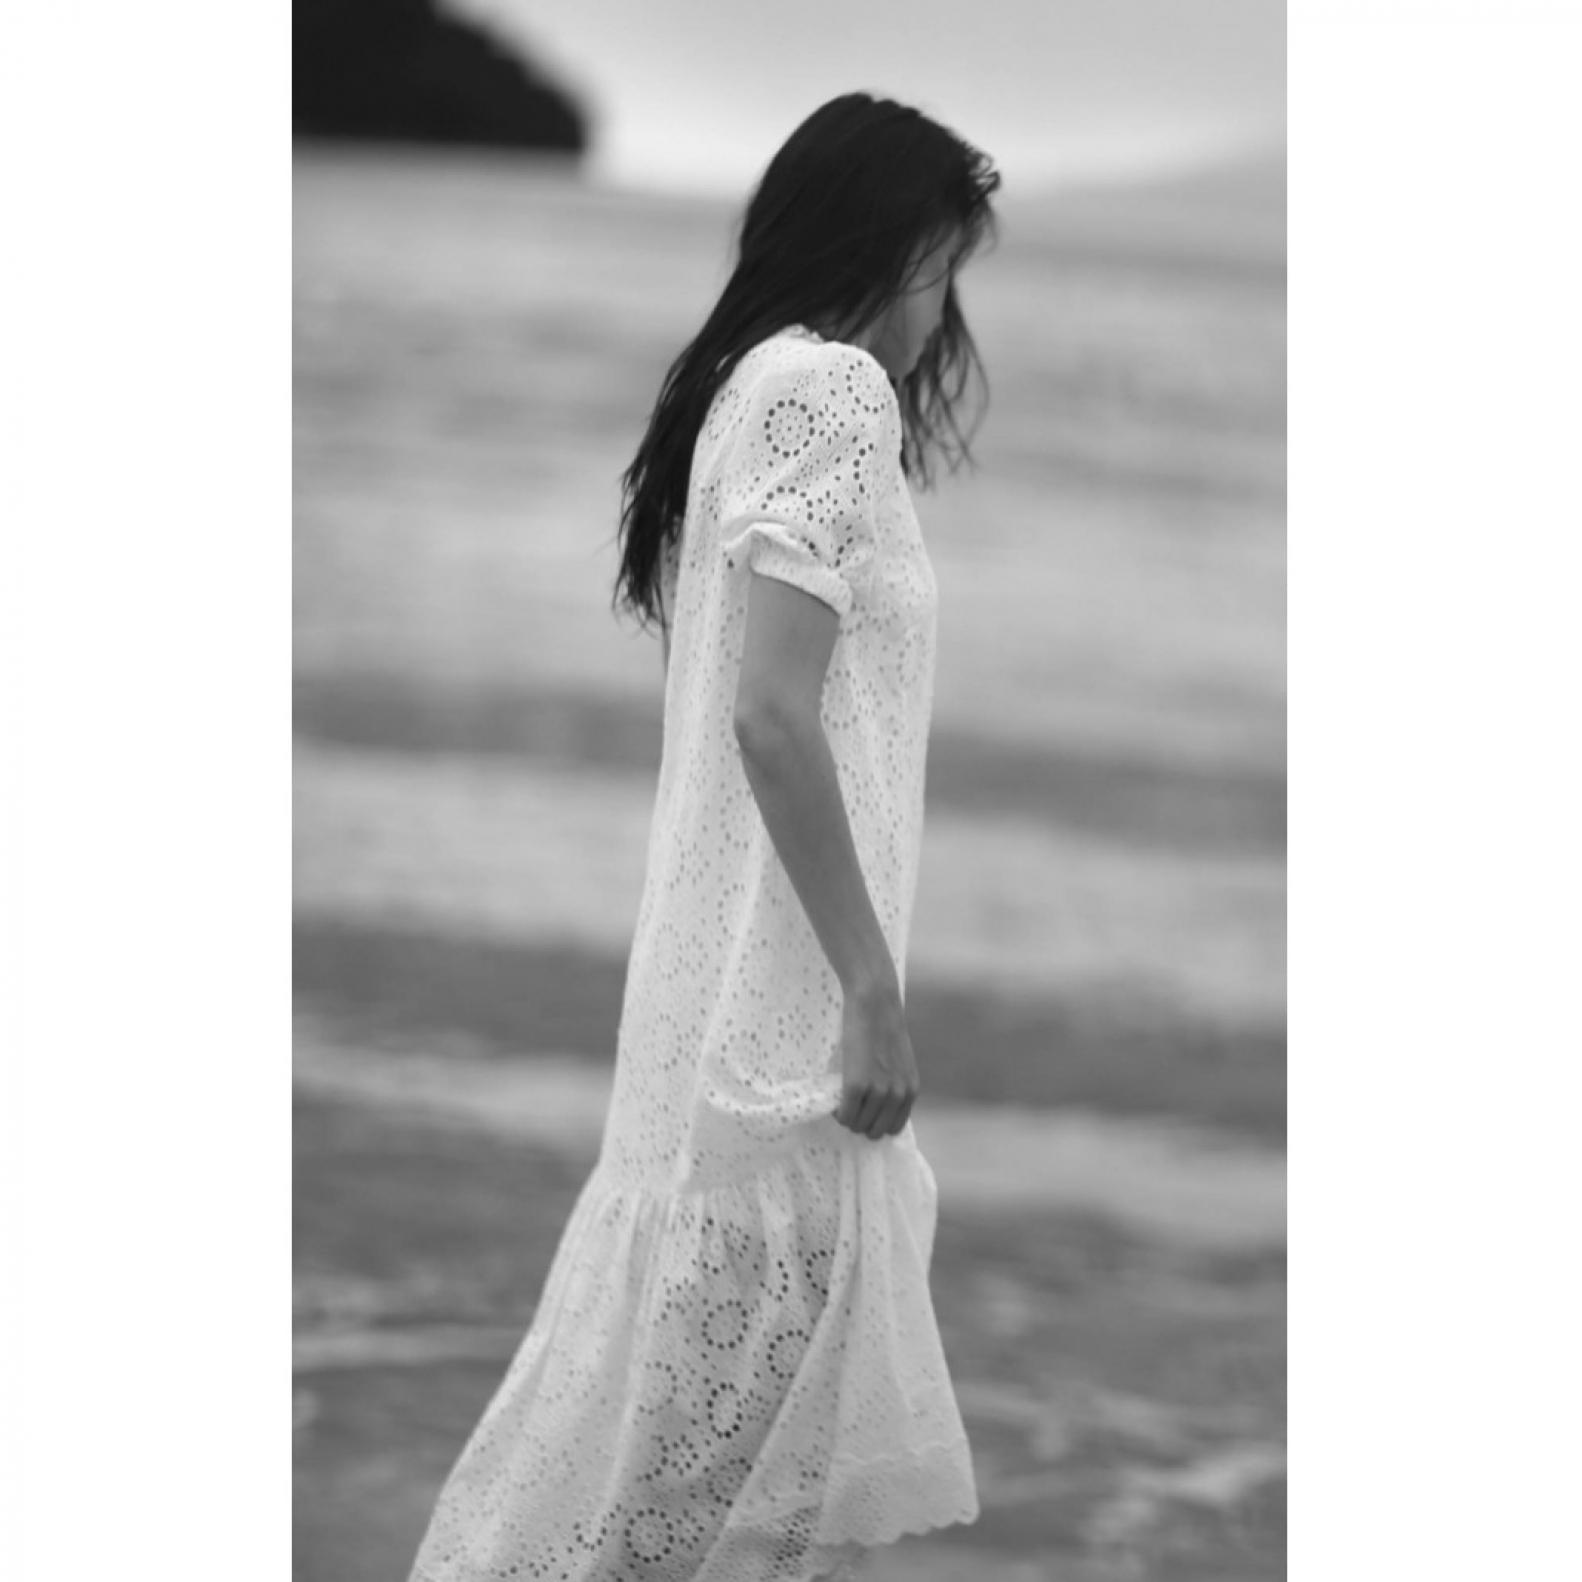 Vestido Laise Branco - Foto 2